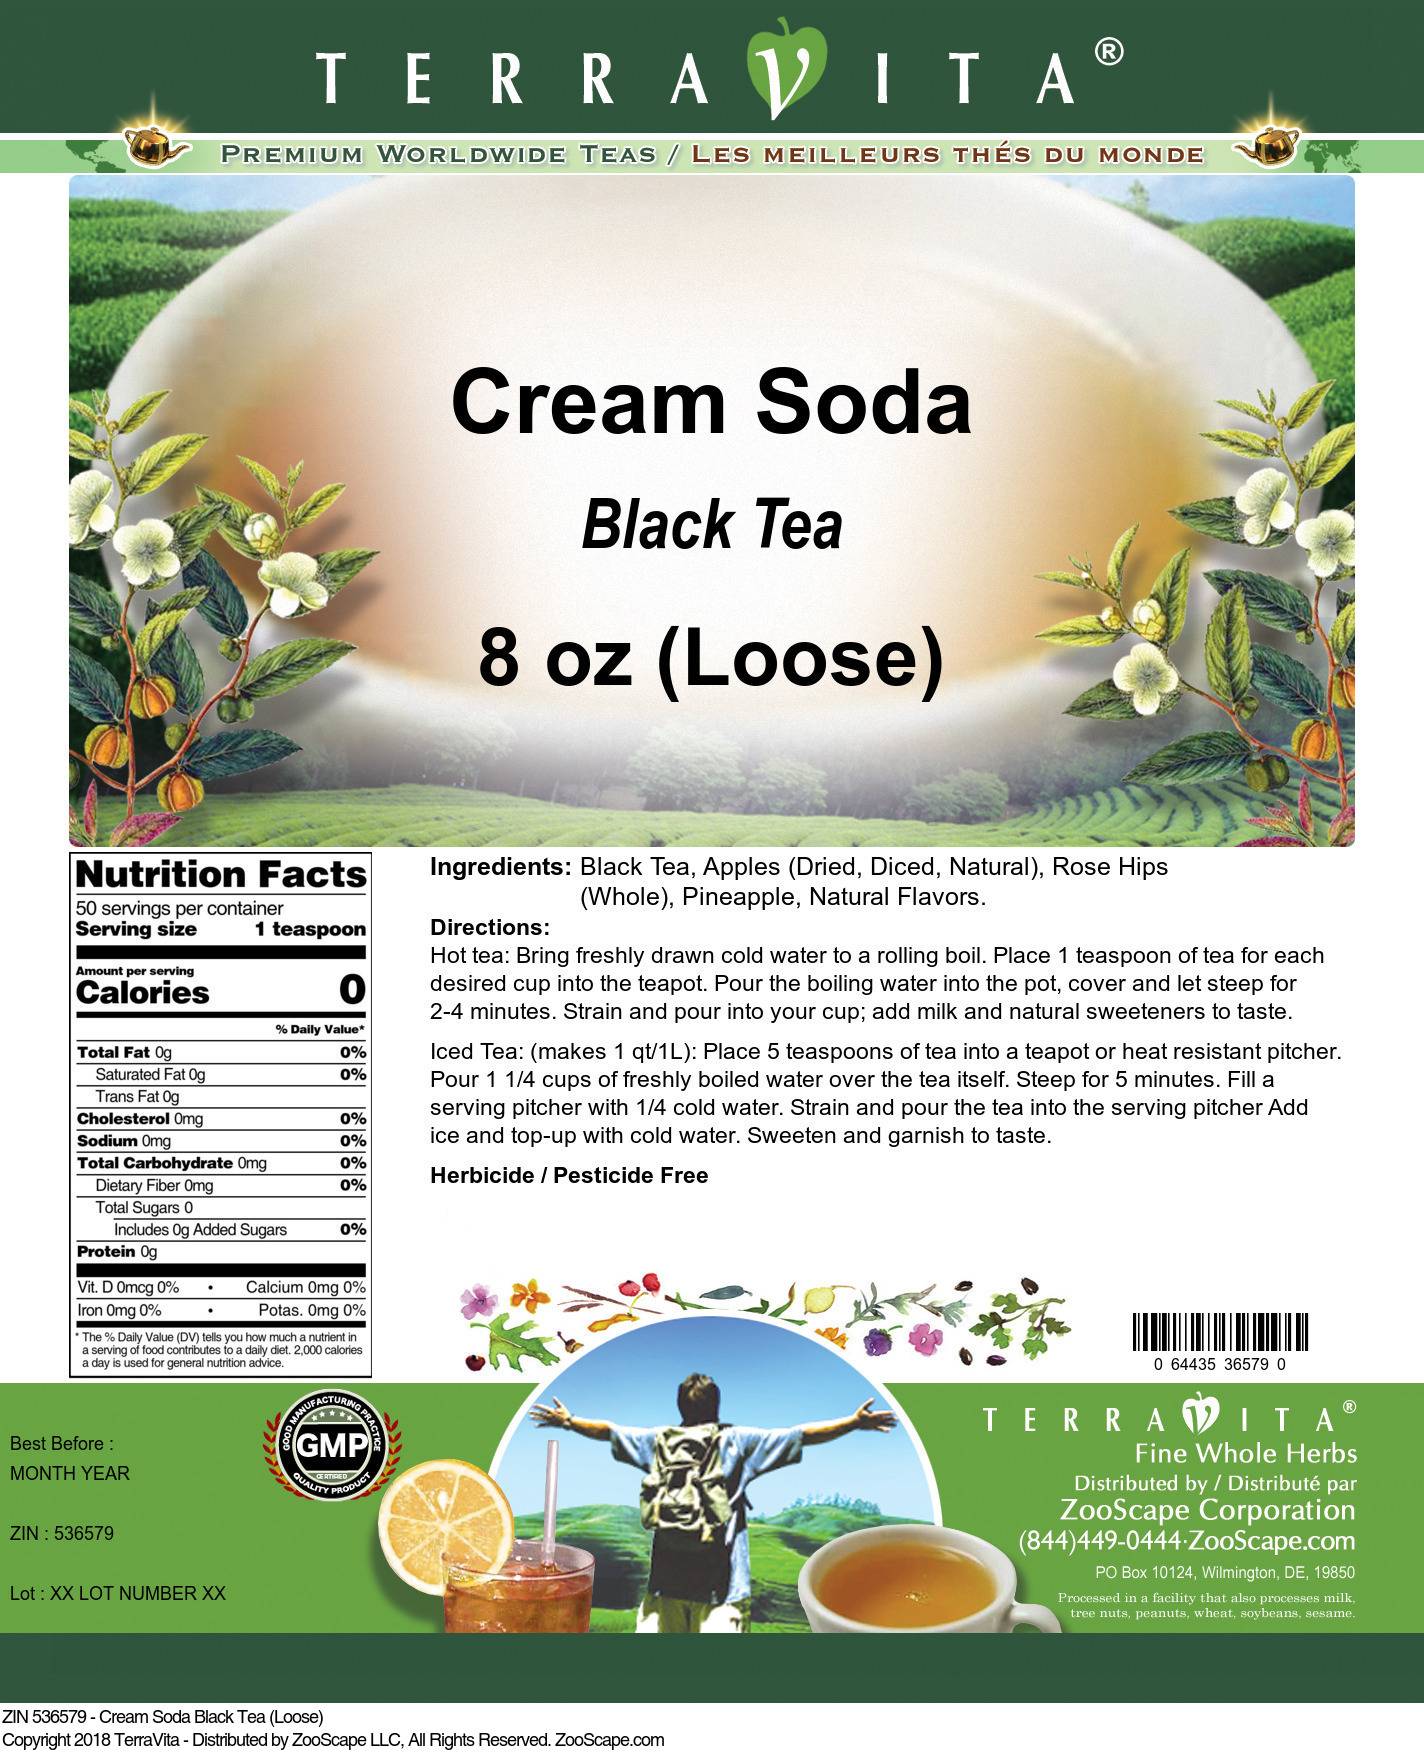 Cream Soda Black Tea